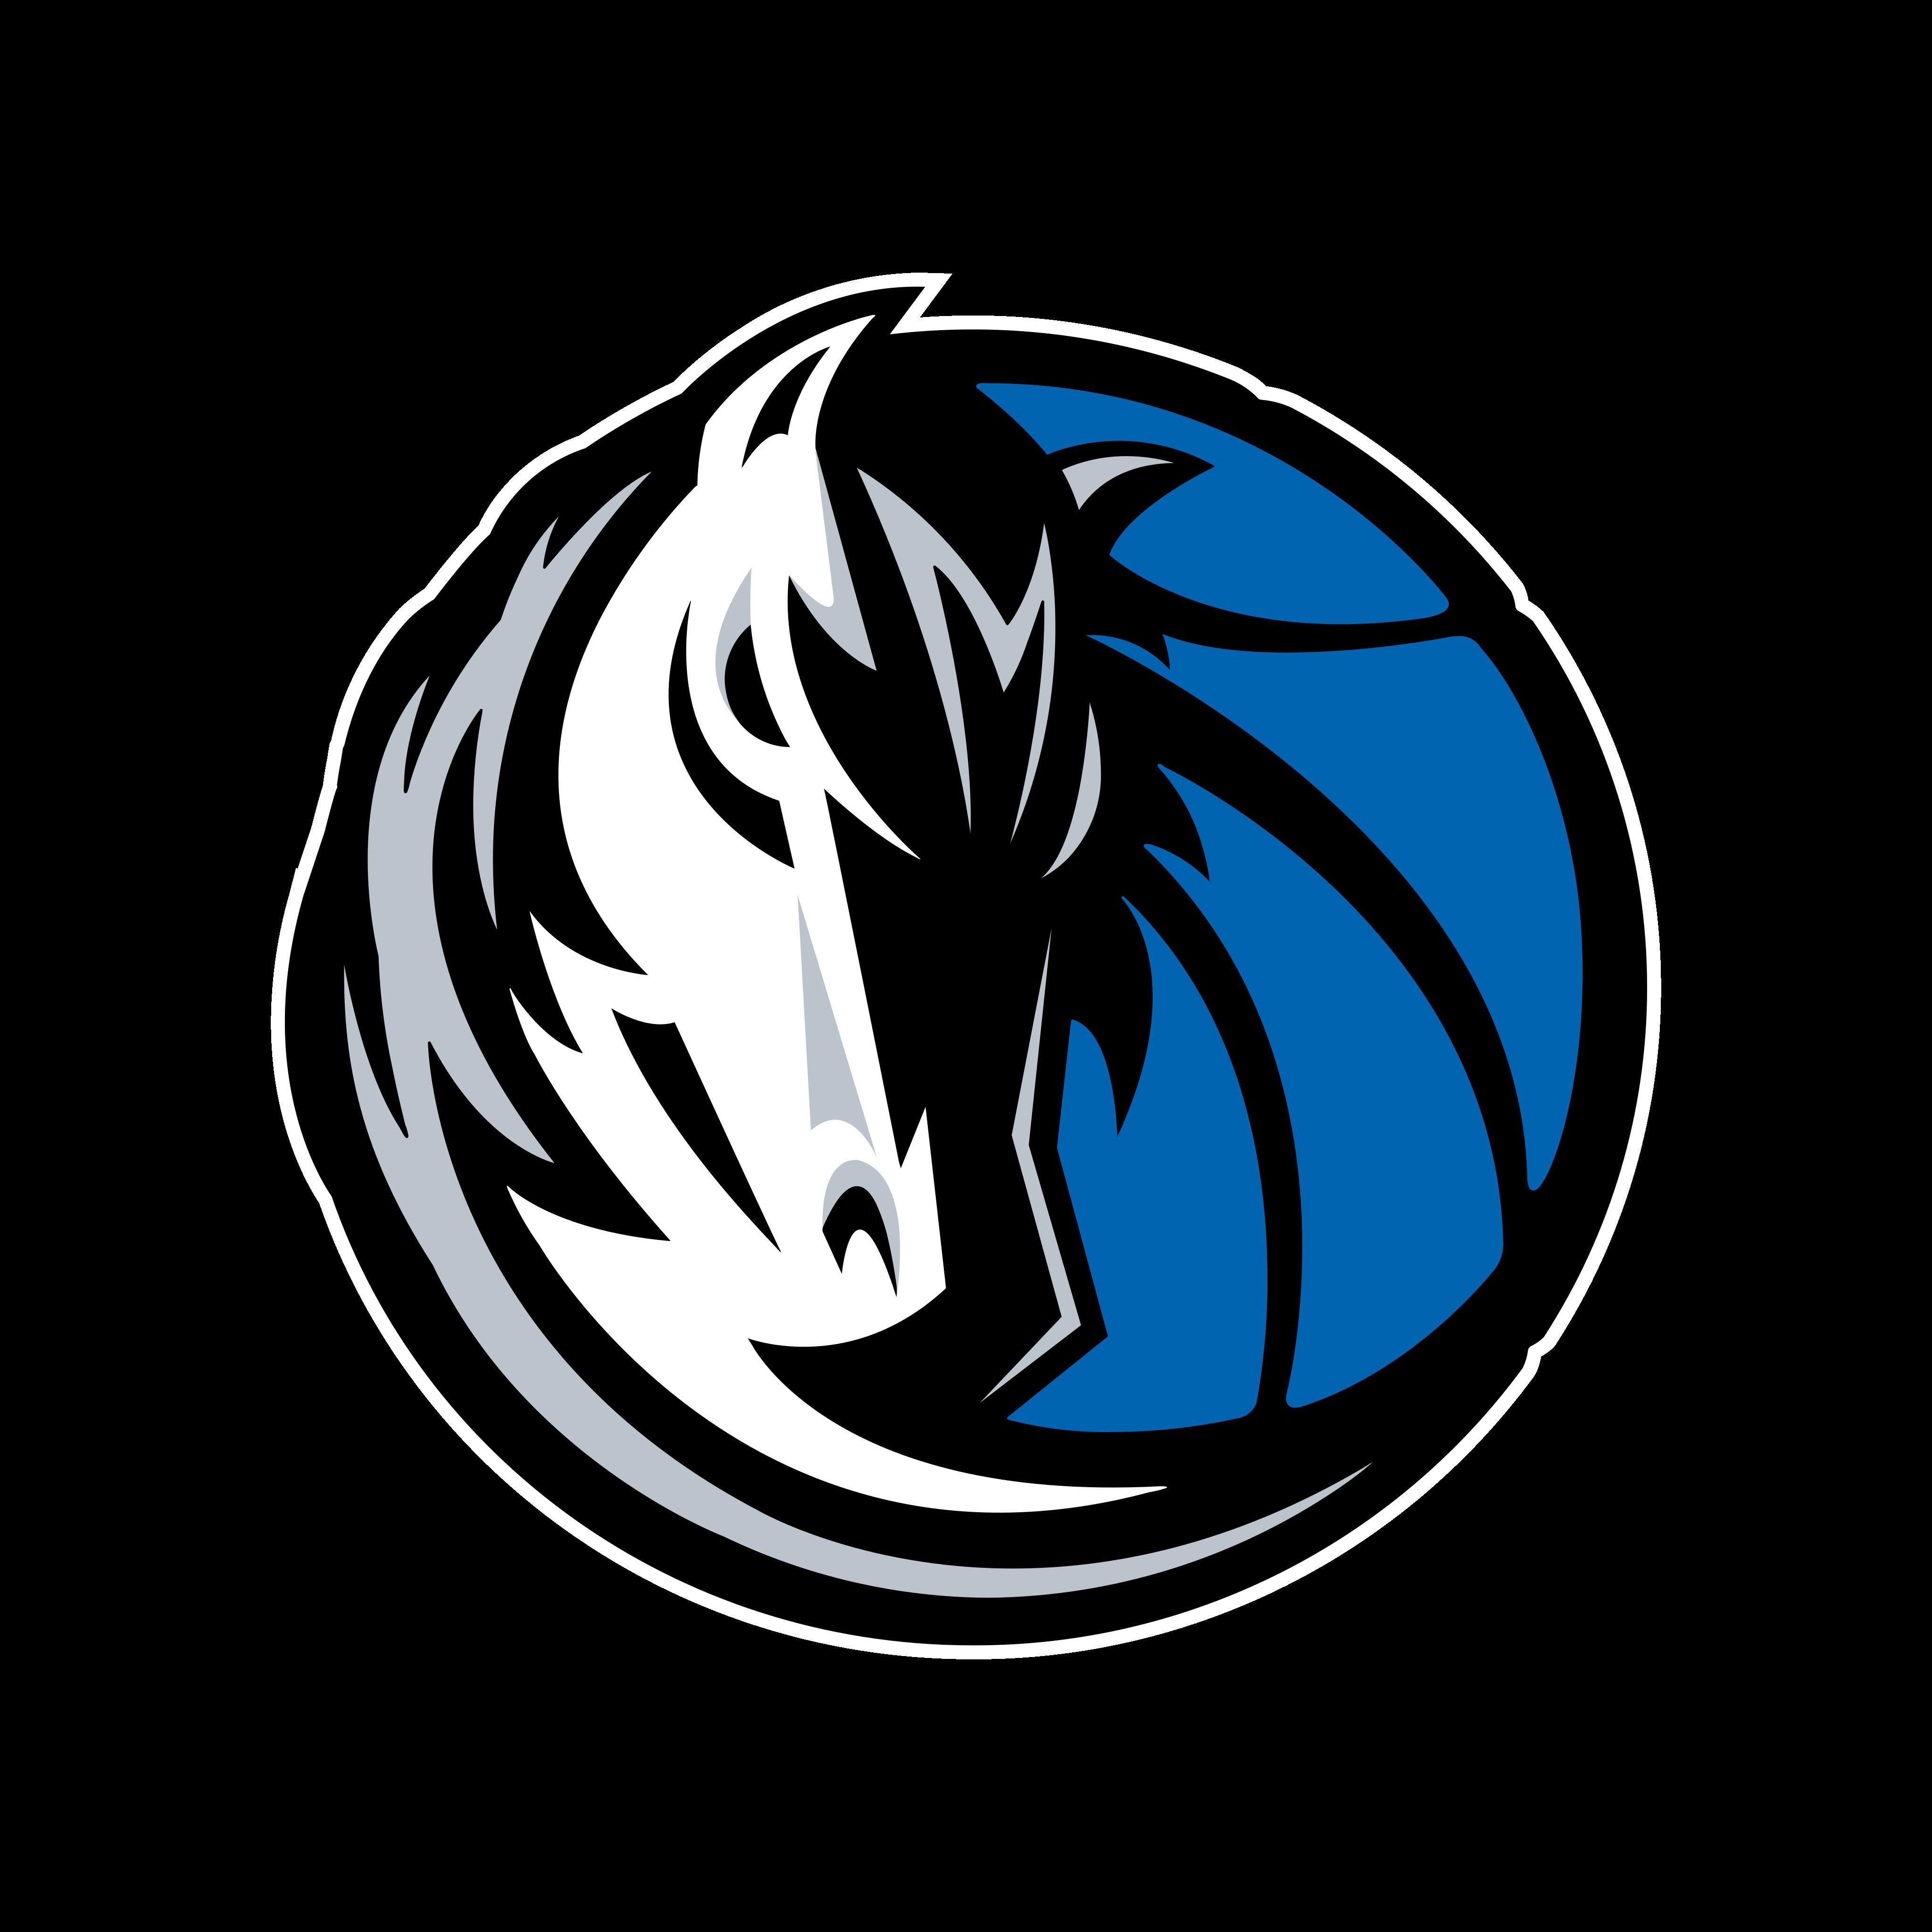 dallas mavericks logo 0 - Dallas Mavericks Logo